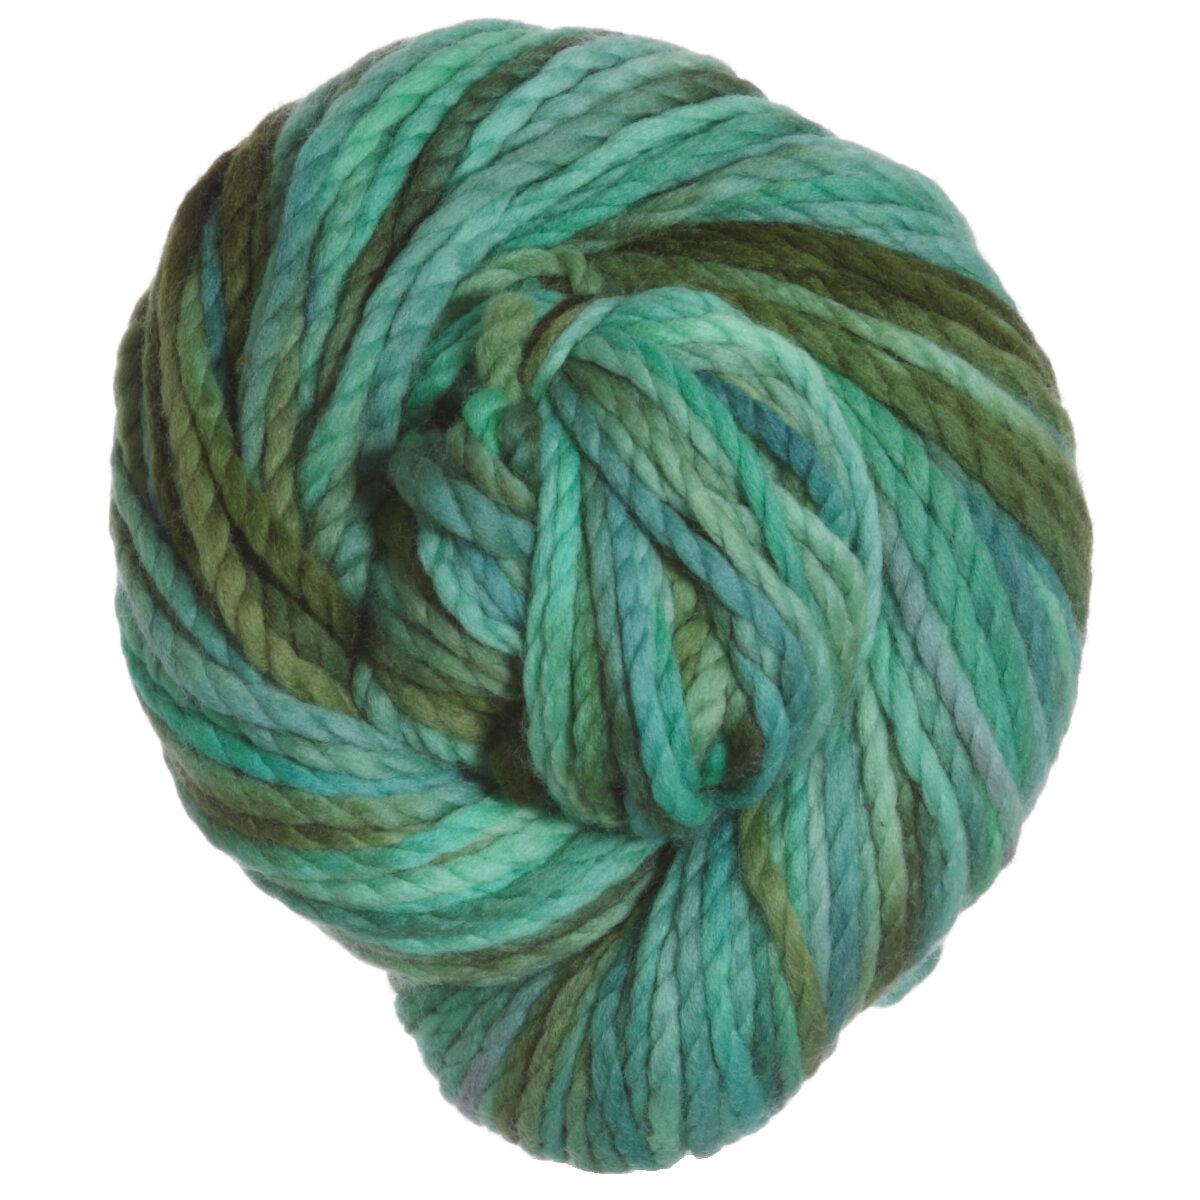 Bulky Yarn : Koigu Bulky Yarn - B50 at Jimmy Beans Wool